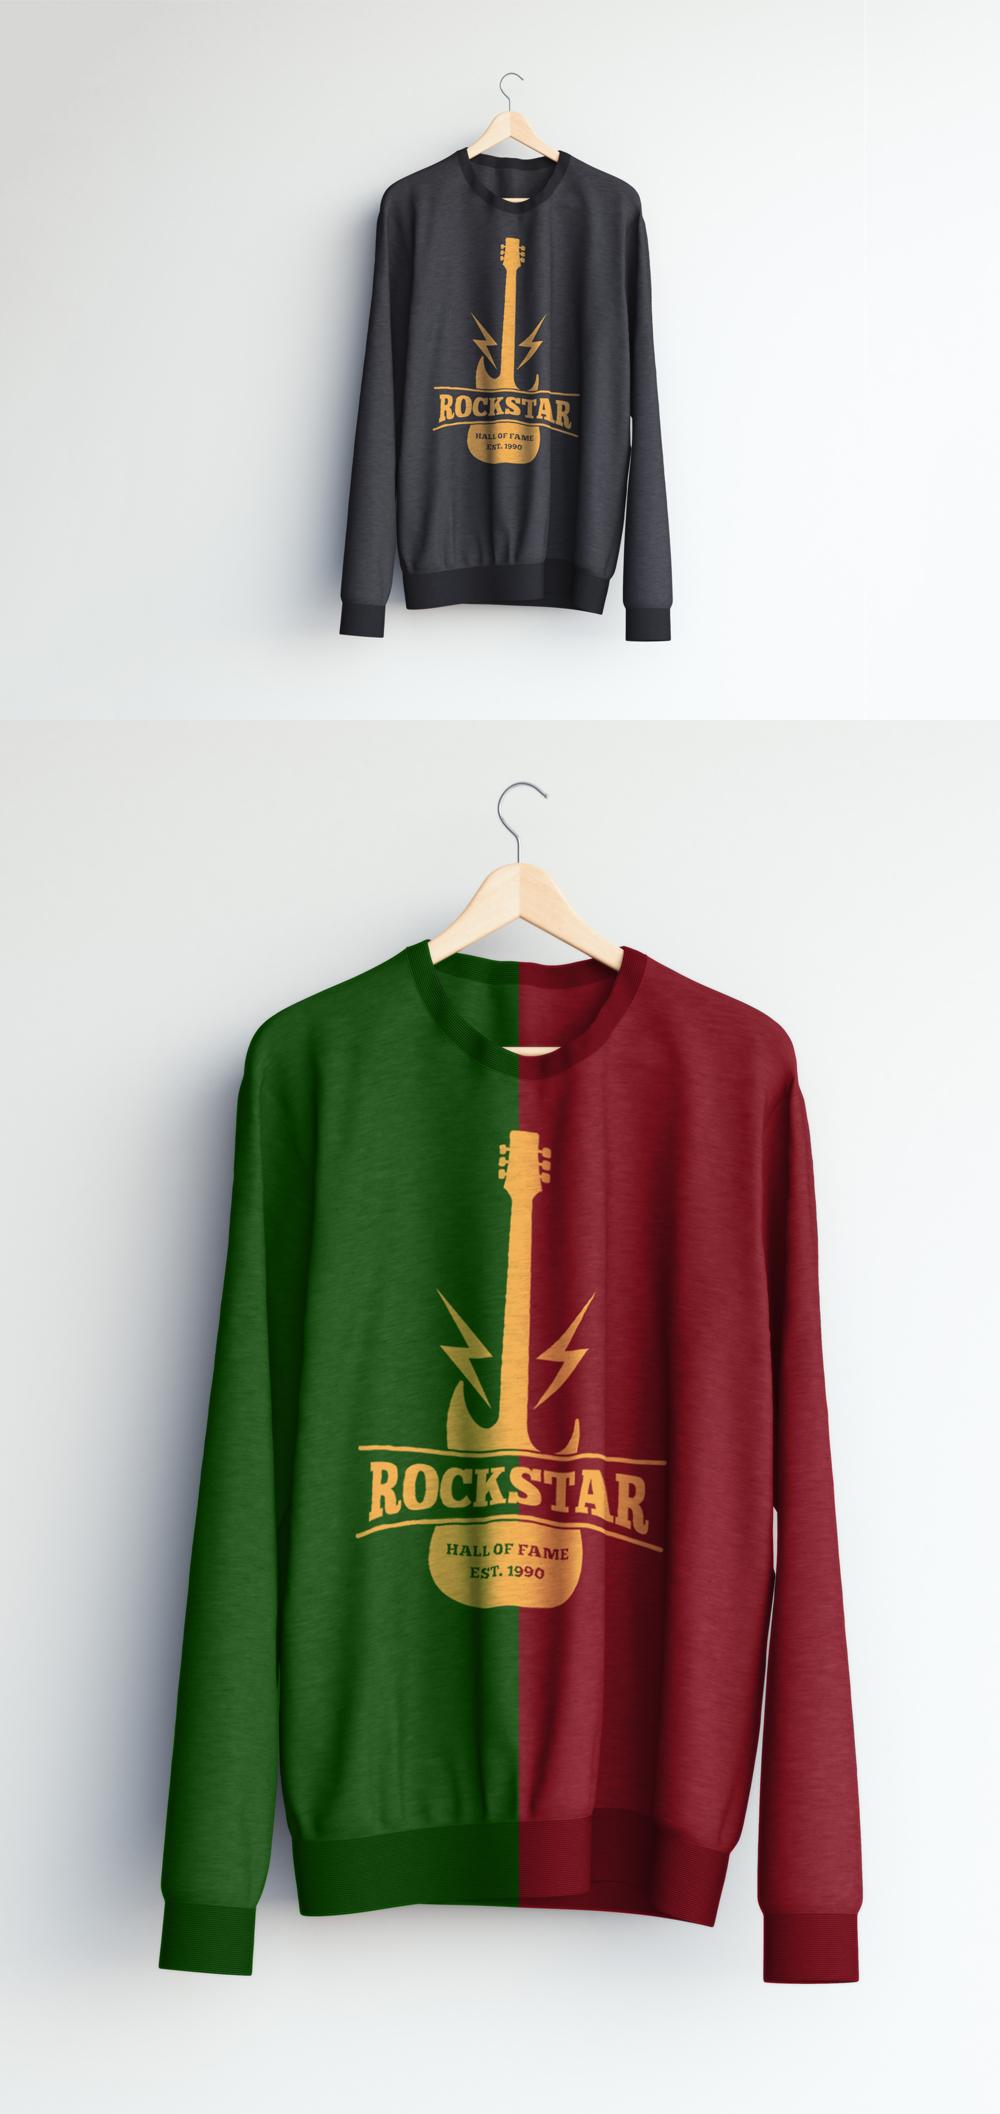 Realistic Sweater Mockup